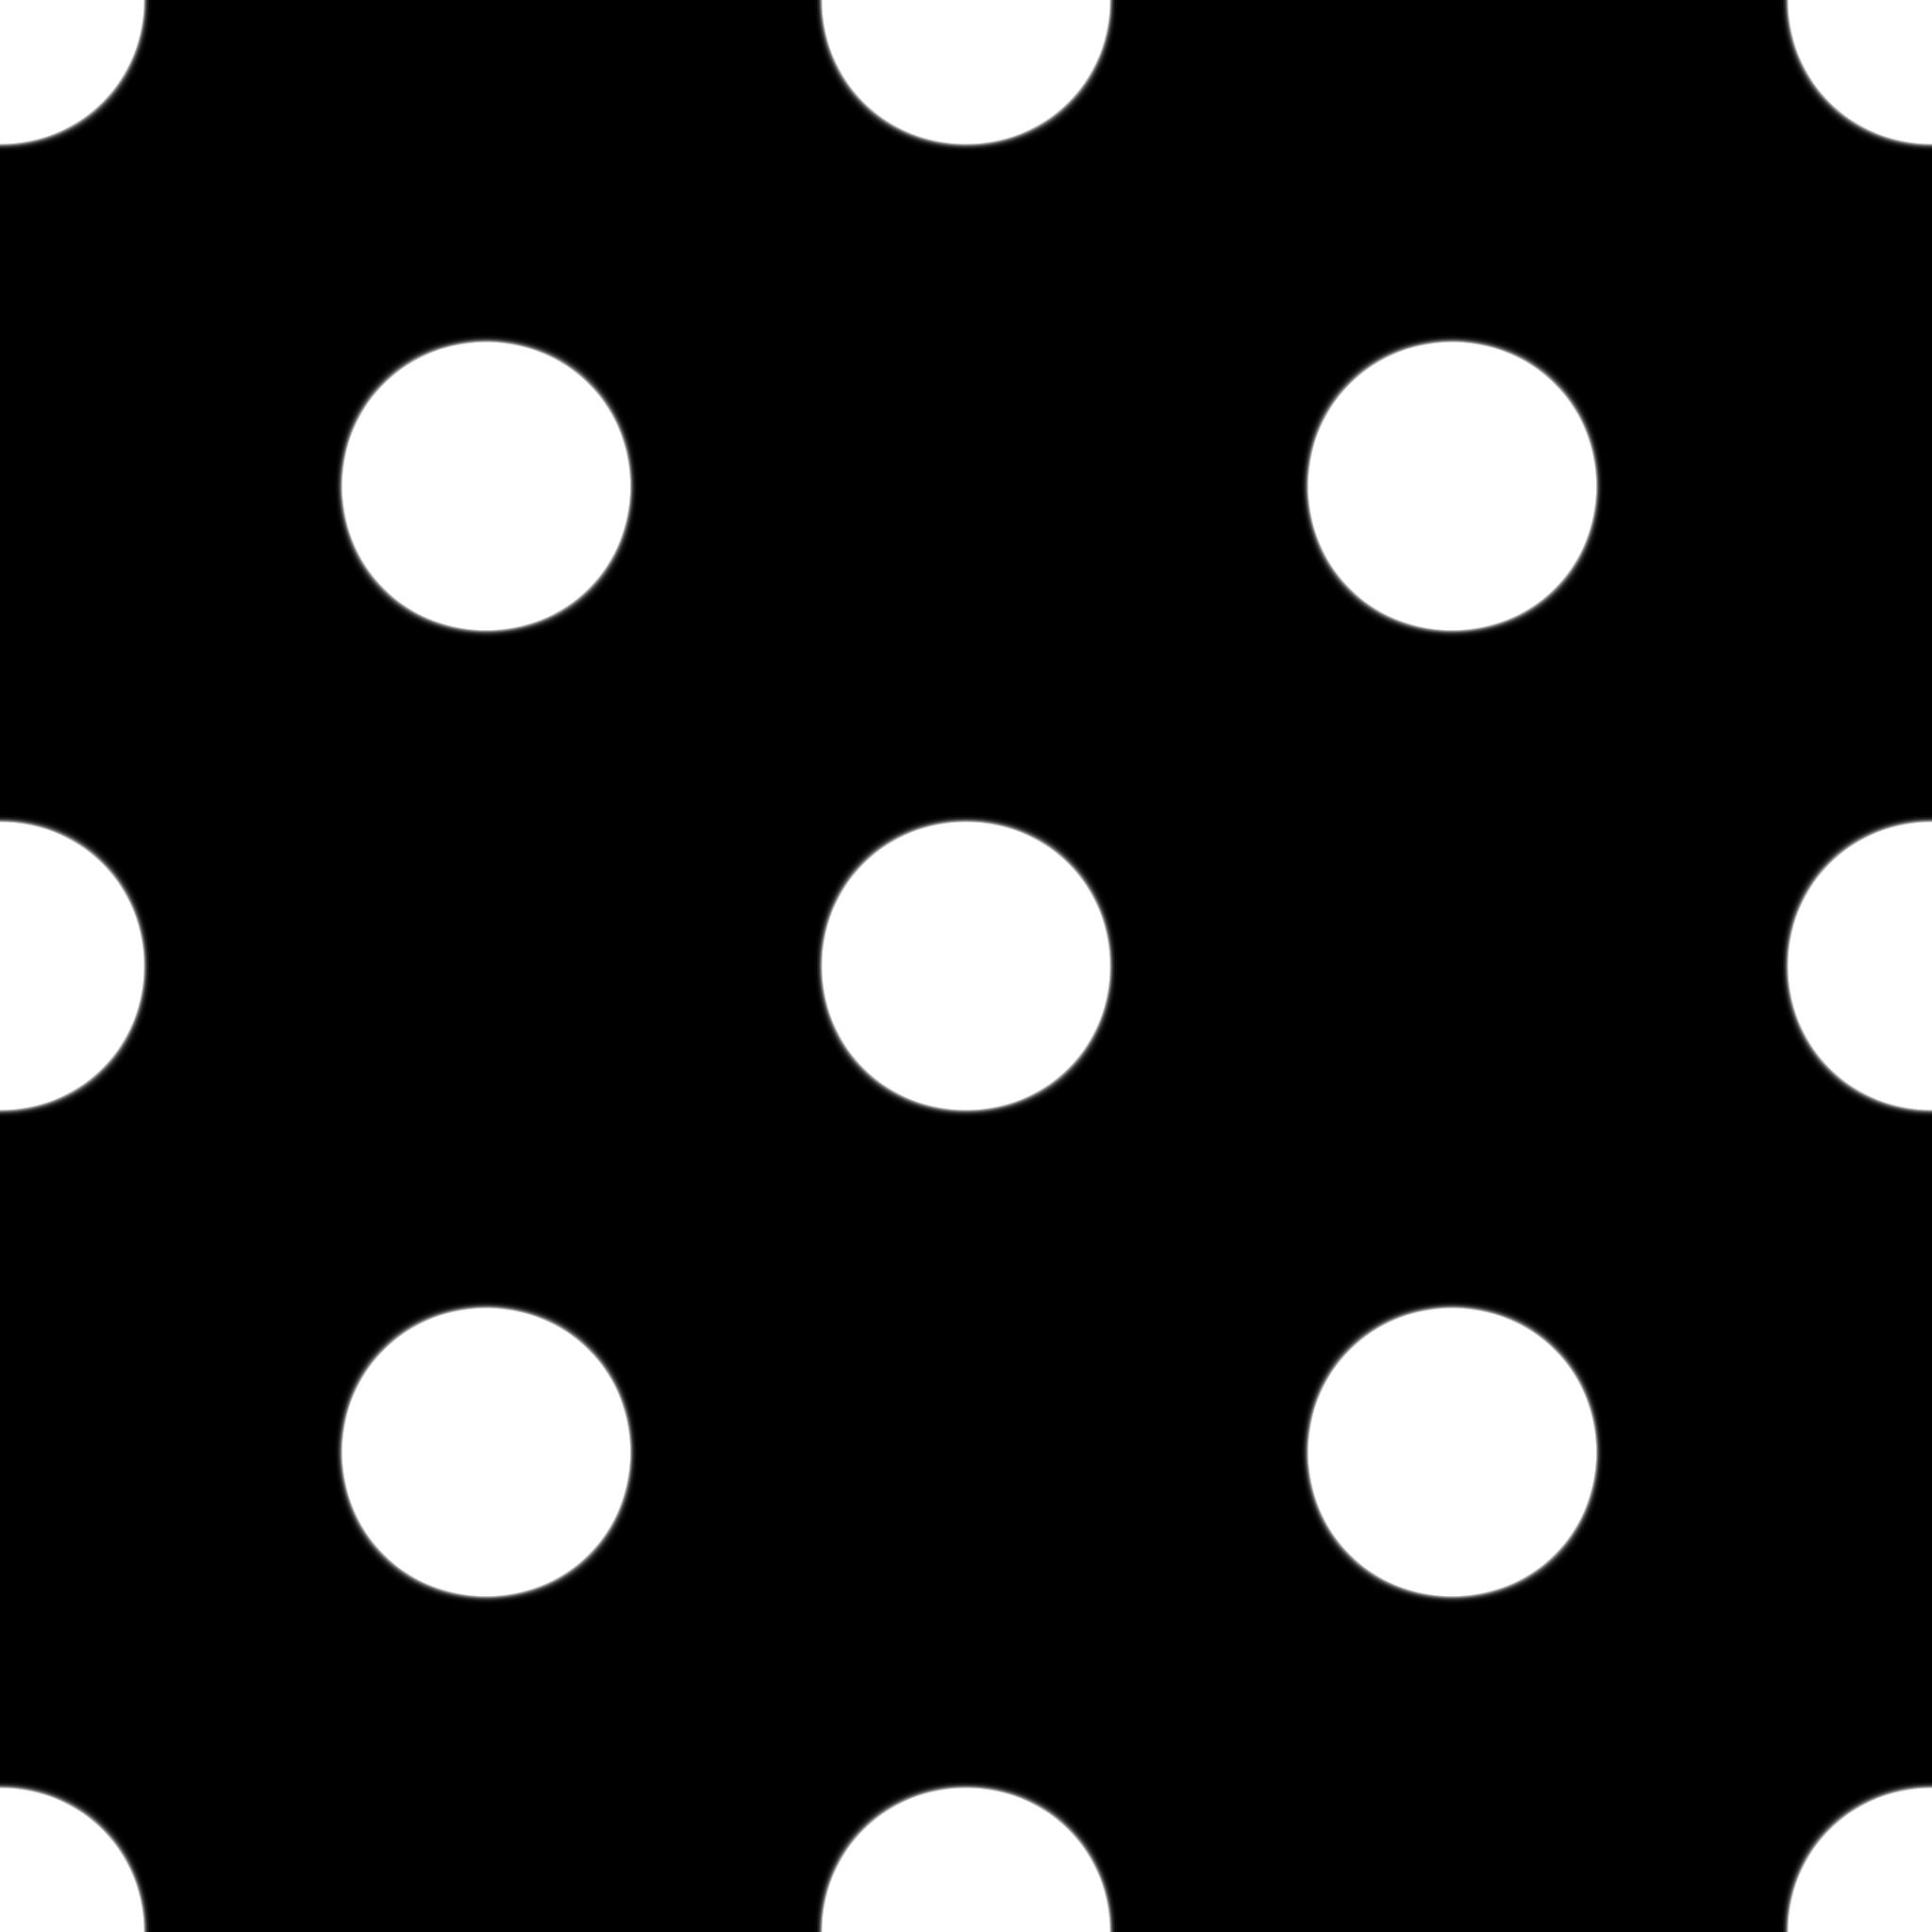 Zbrush笔刷:衣服雕刻细节